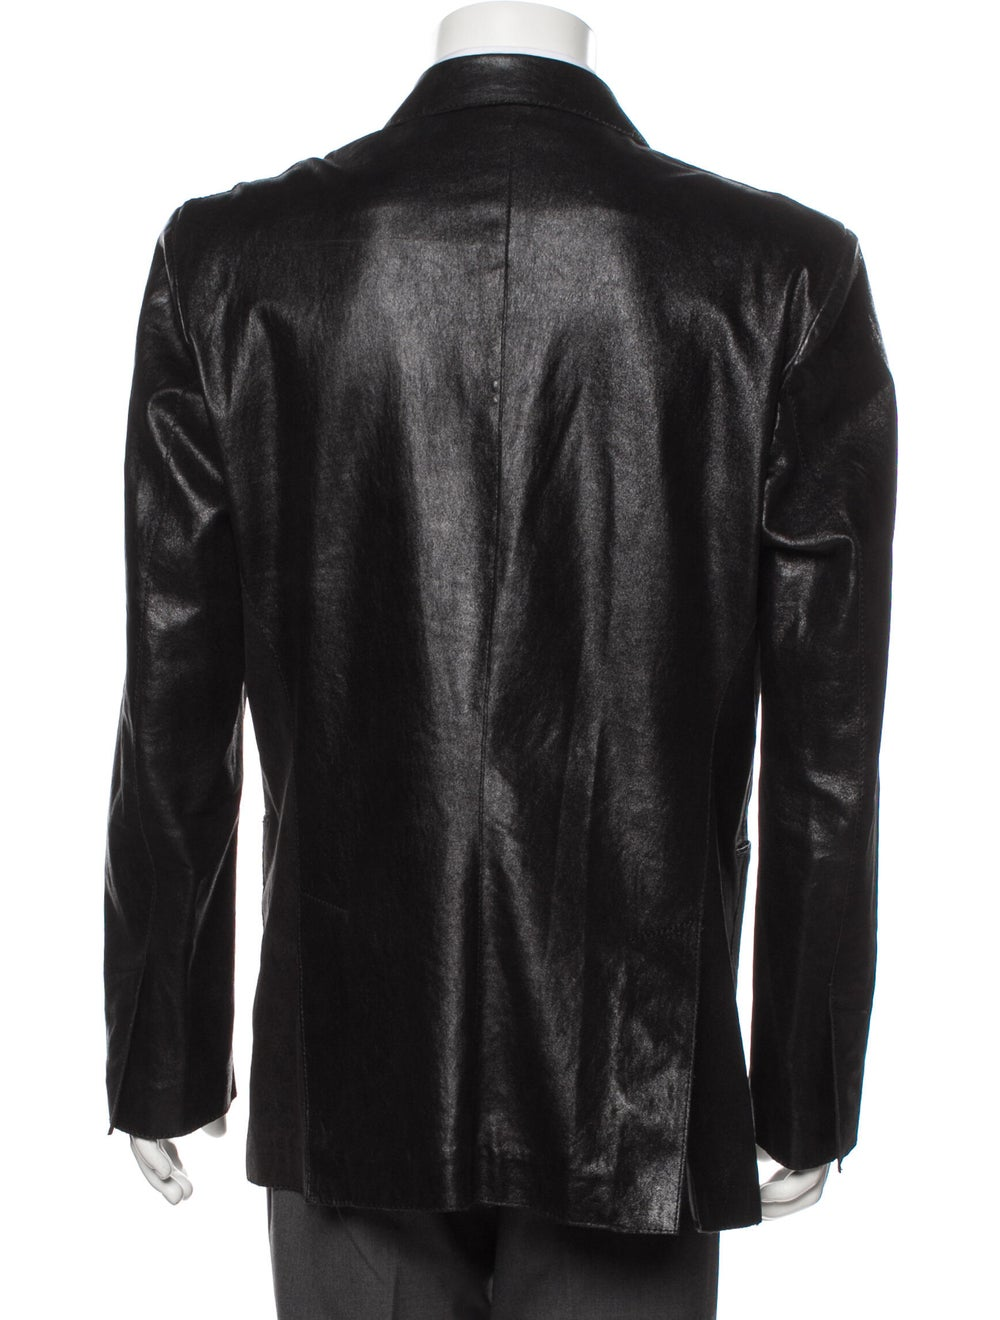 Jitrois Jacket Black - image 3